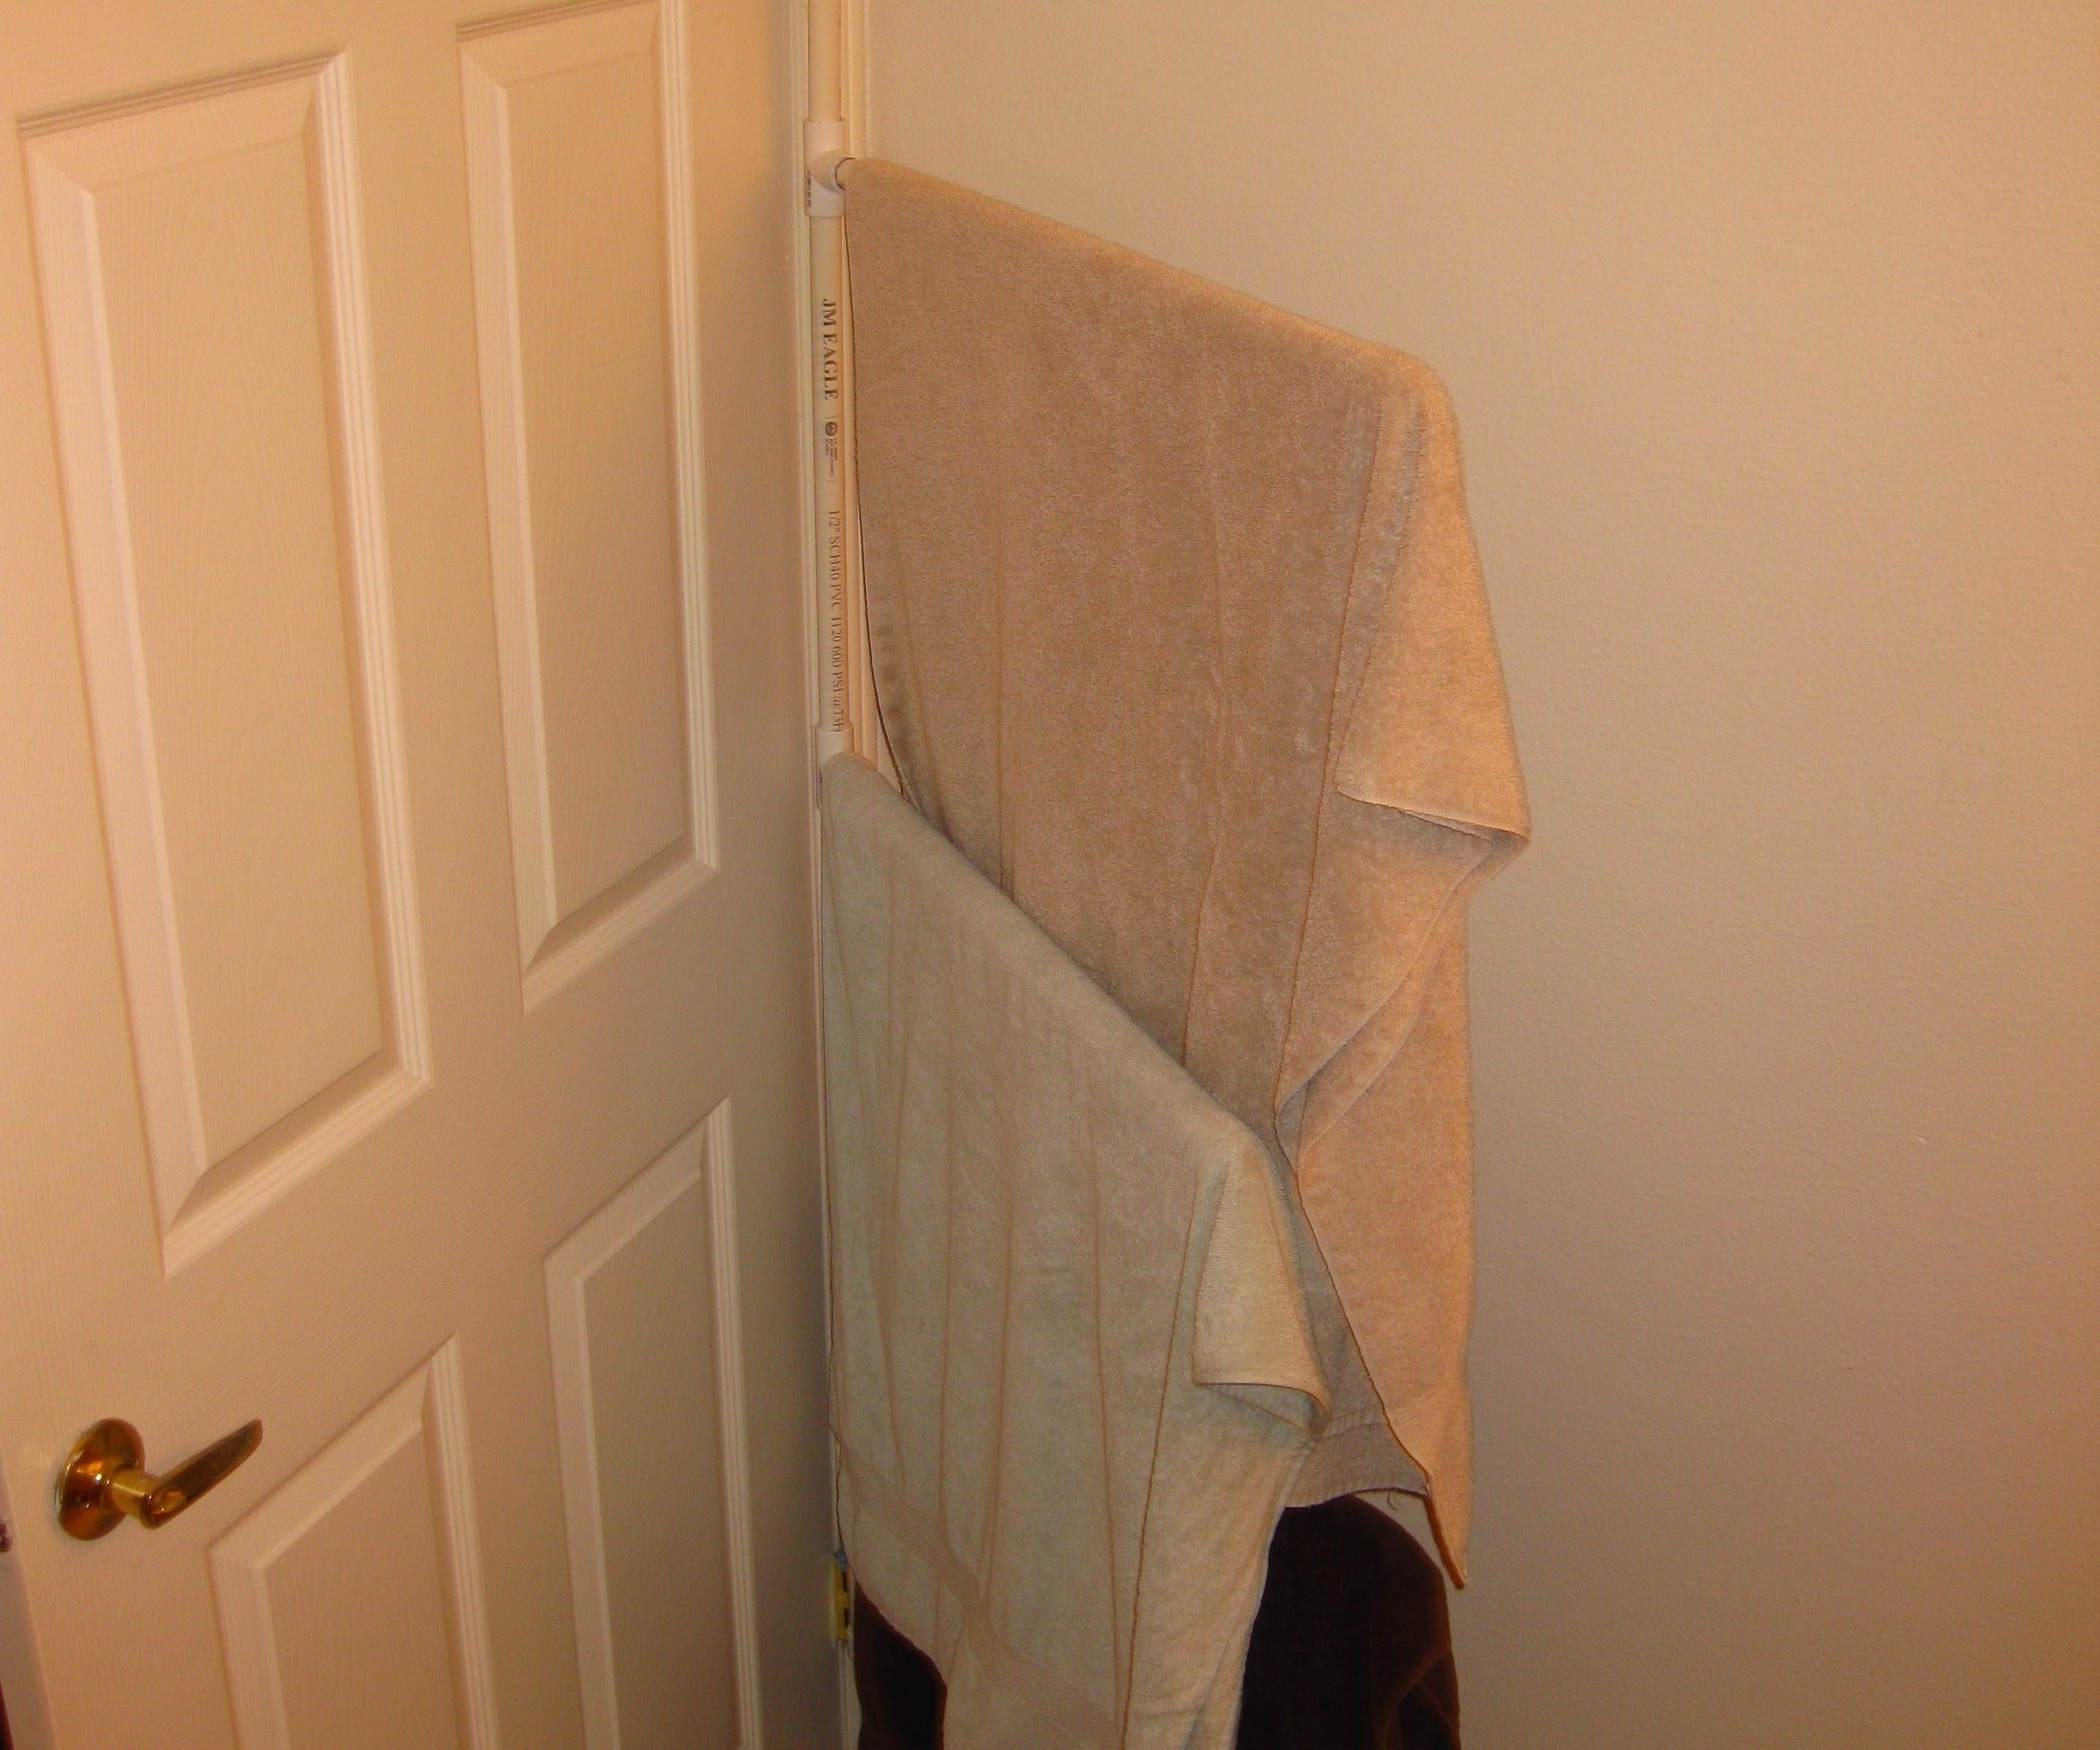 Bathroom Door Hinge Towel Rack Bathroom Design Ideas with regard to dimensions 2100 X 1750